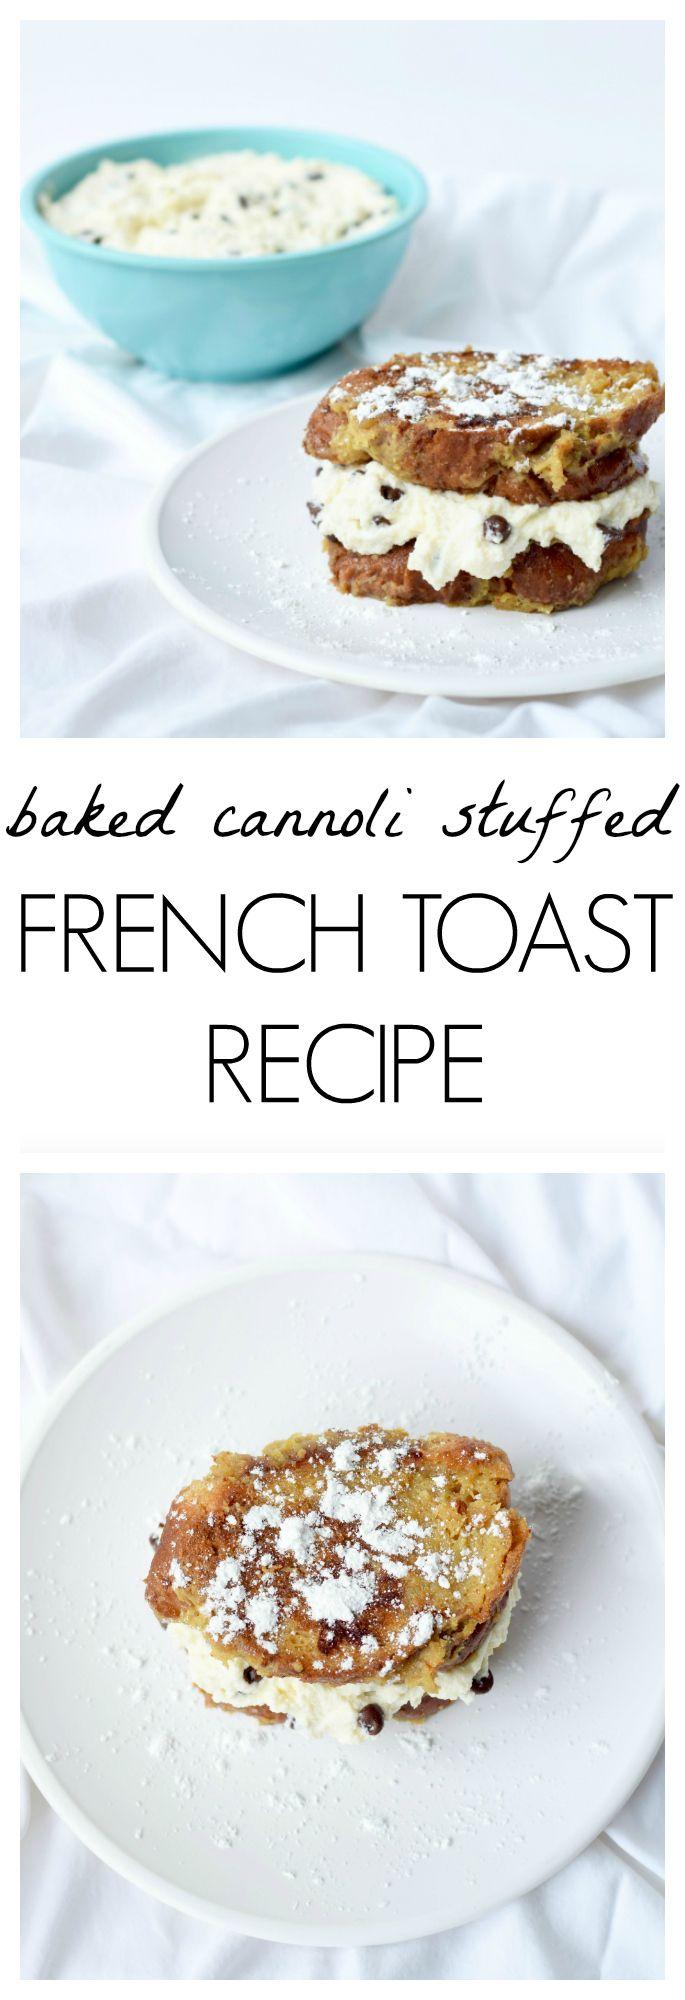 Baked Cannoli Stuffed French Toast Recipe